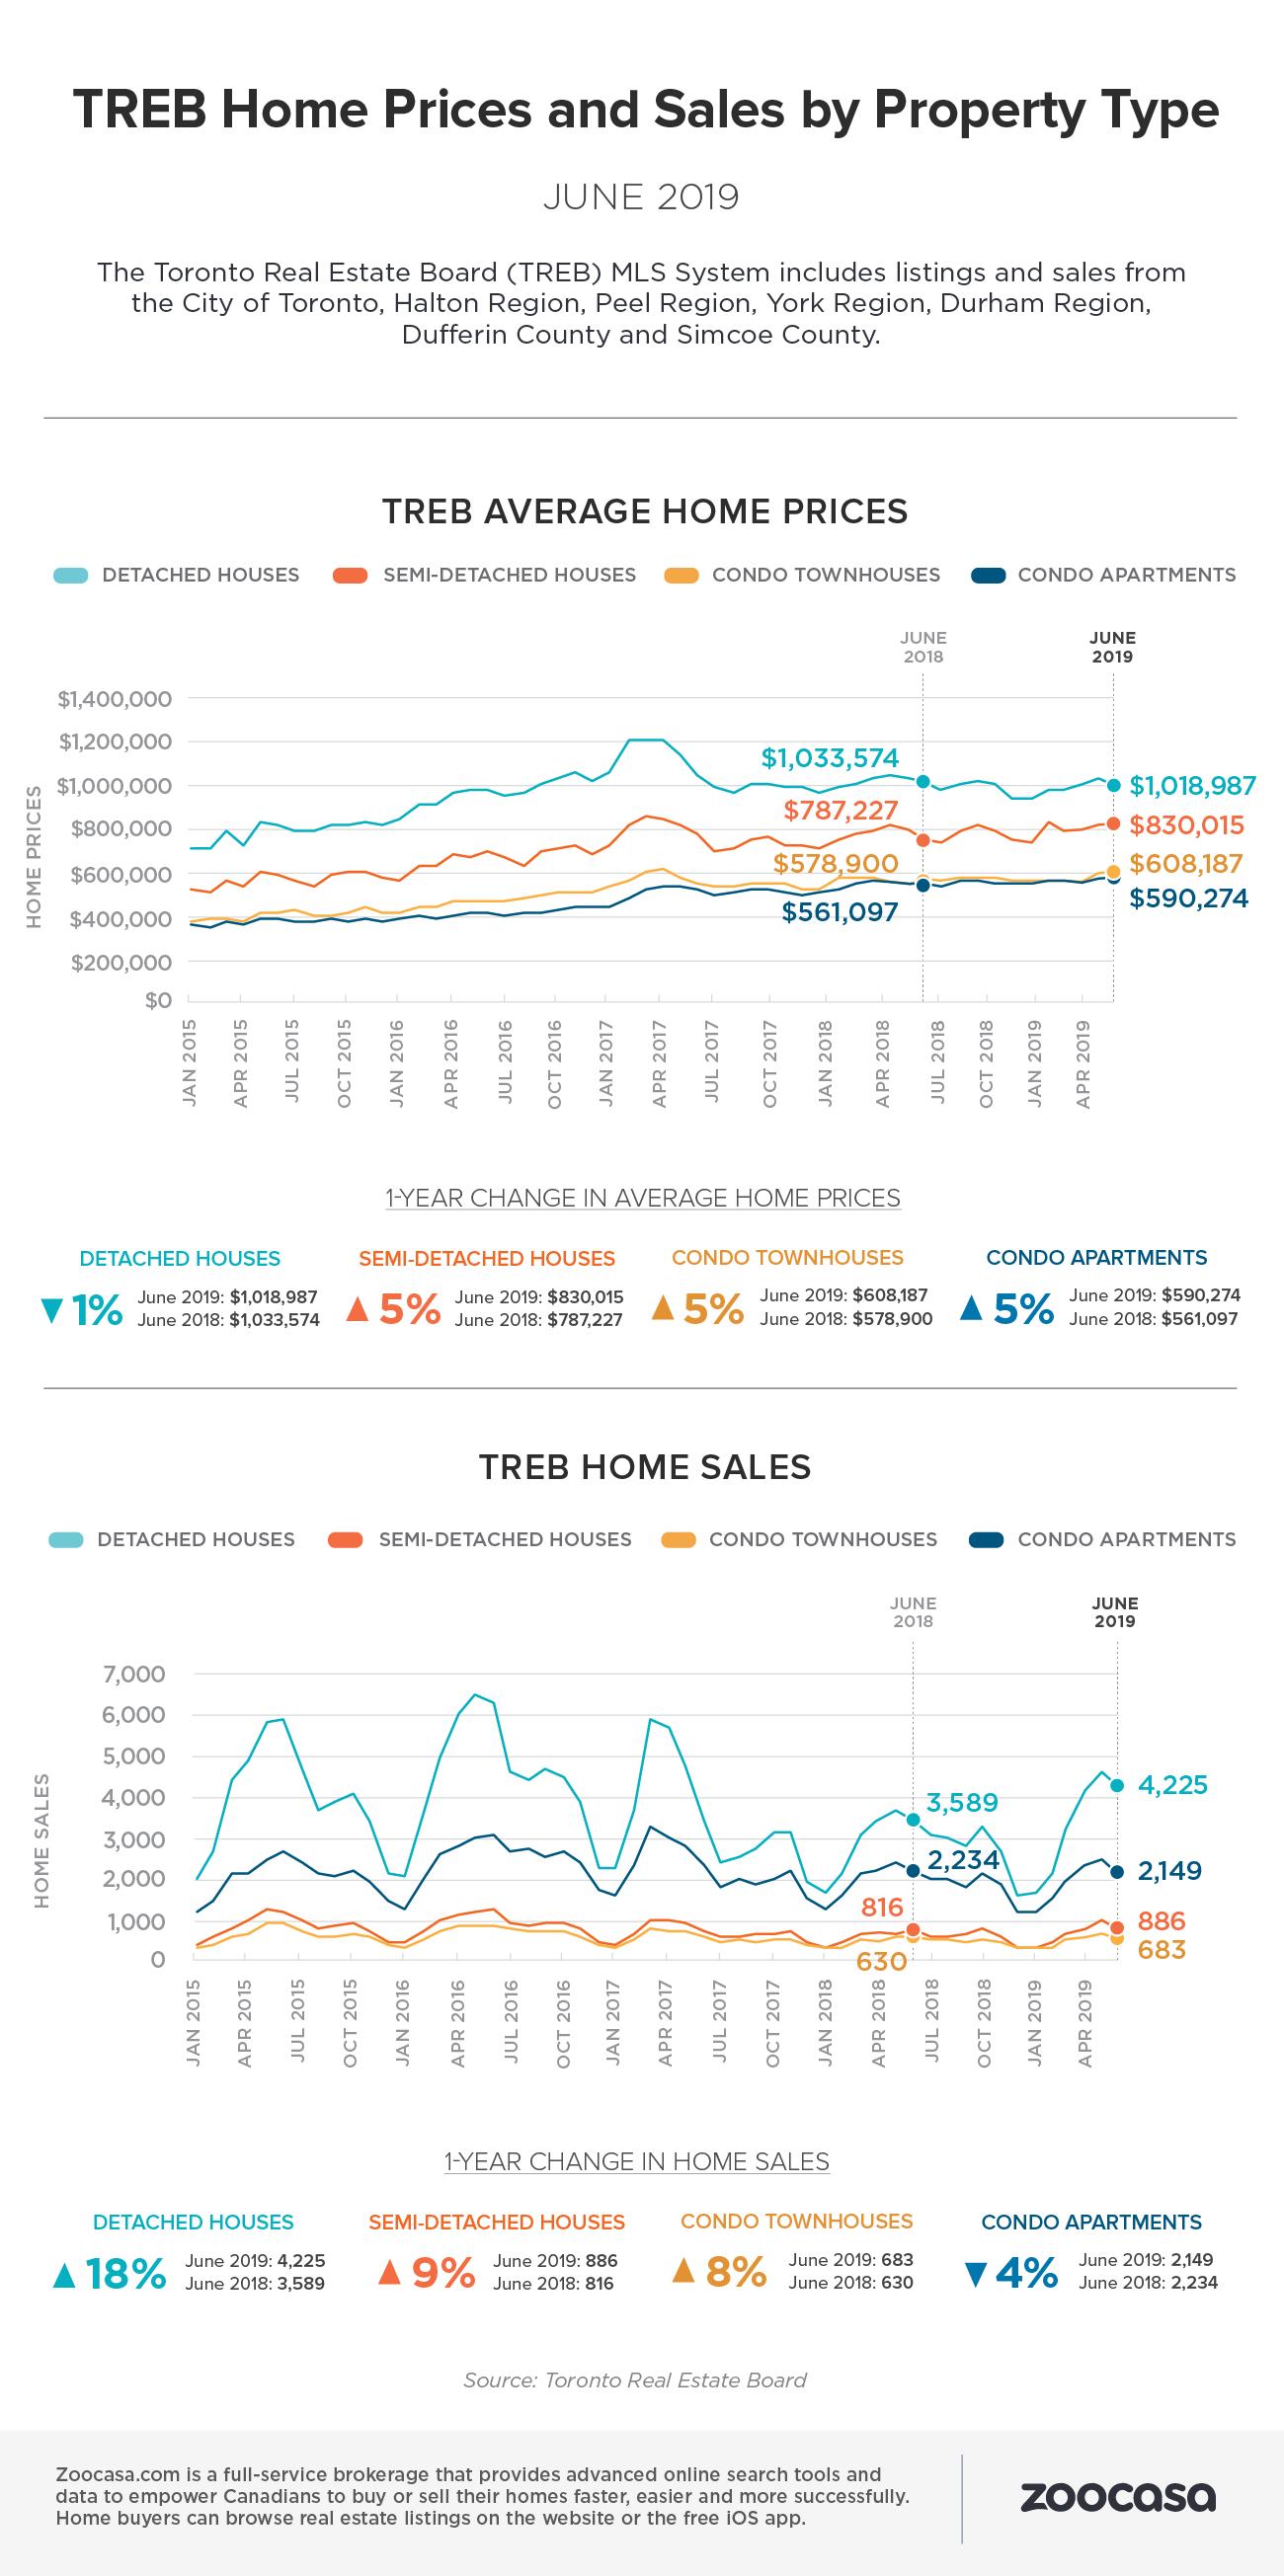 treb-home-sales-prices-june-2019